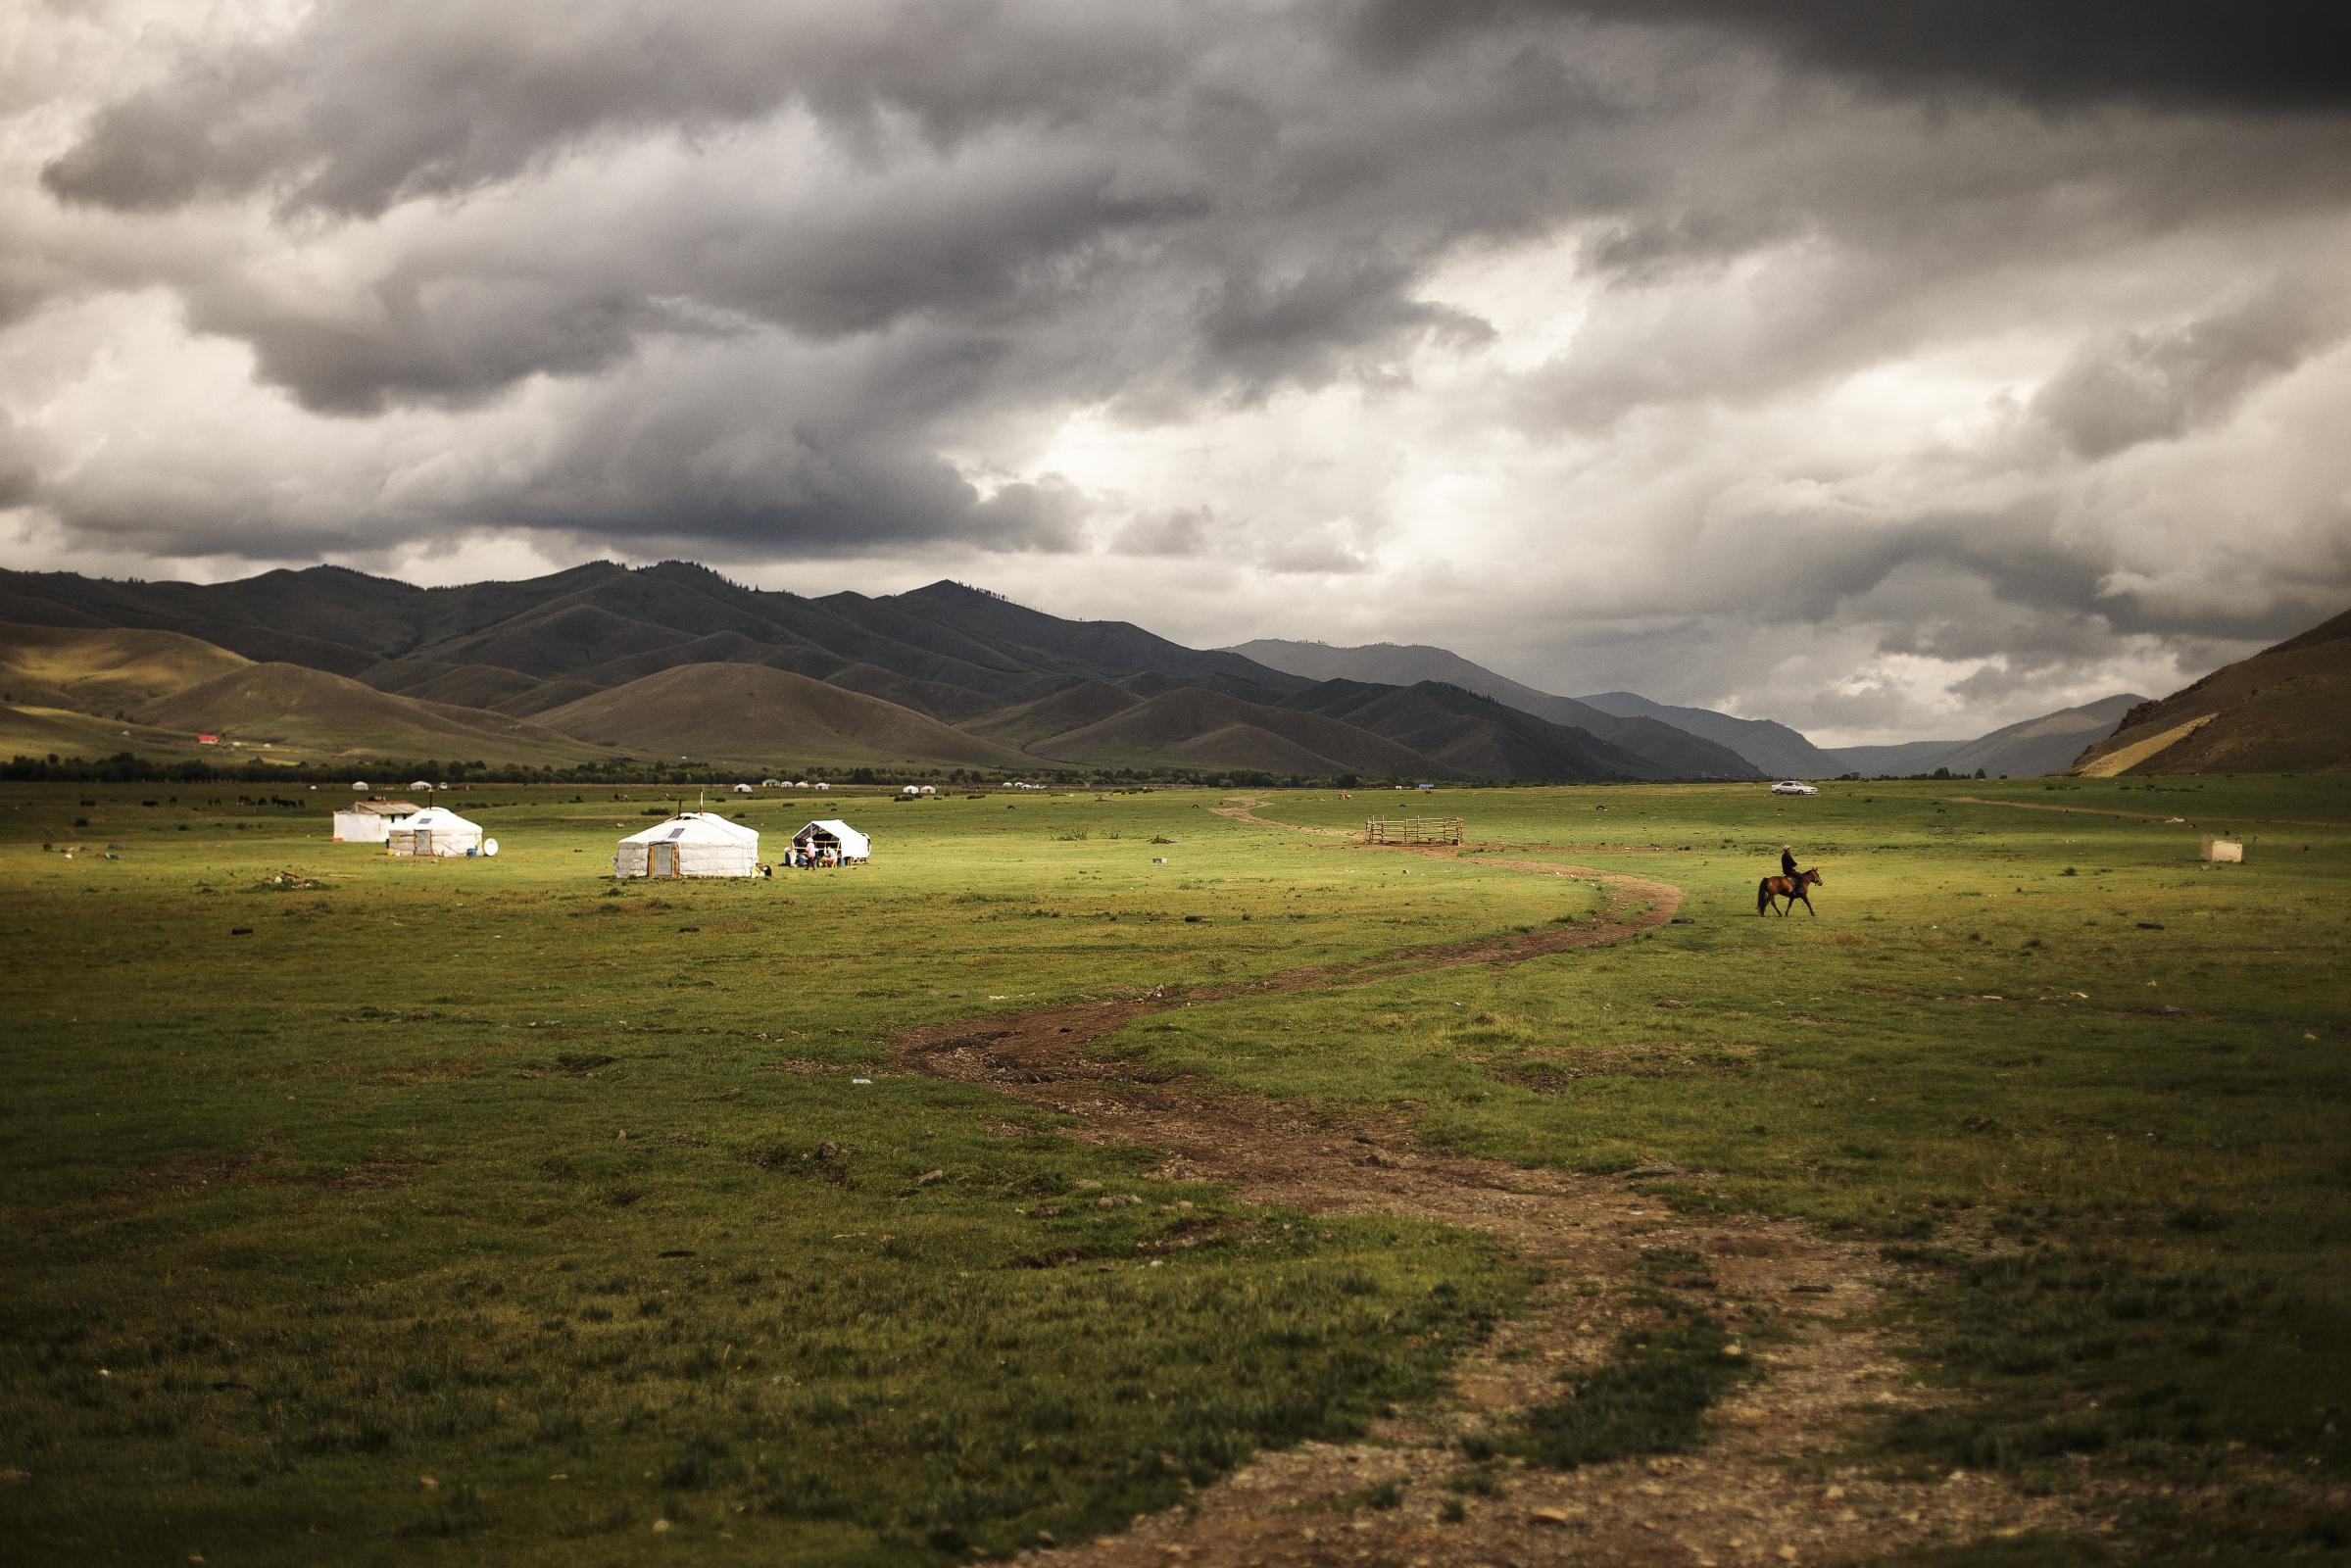 yurts-mongolia-1154419-wallpaper.jpg?dow